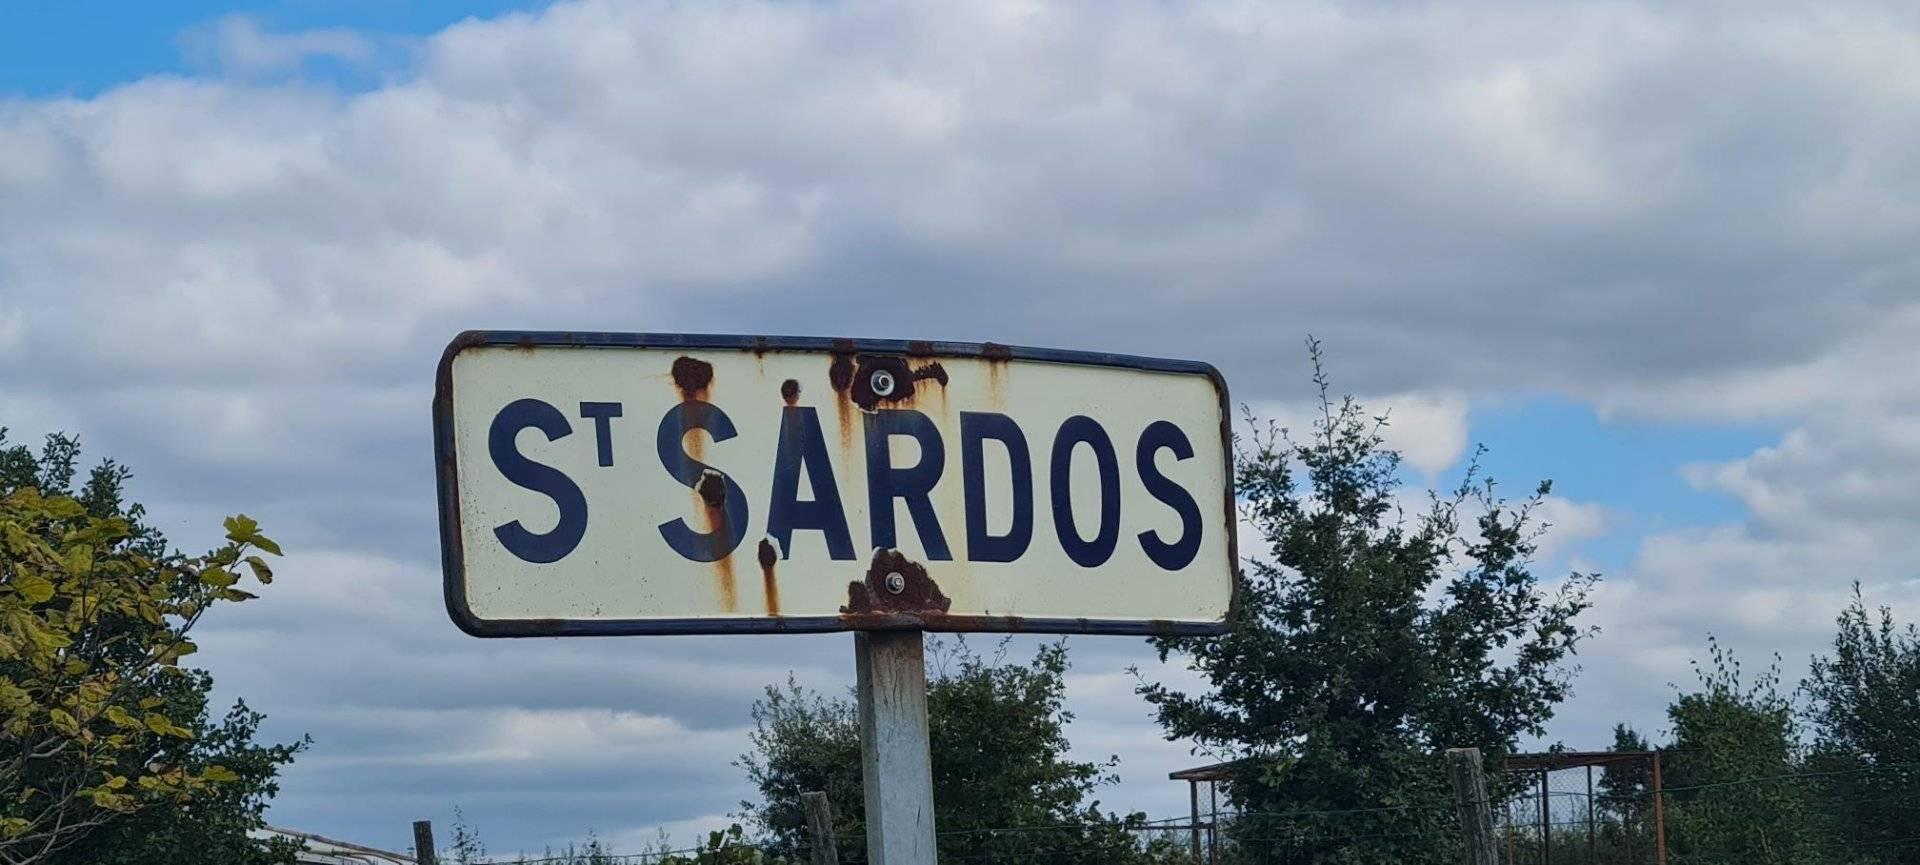 1 46 Saint-Sardos